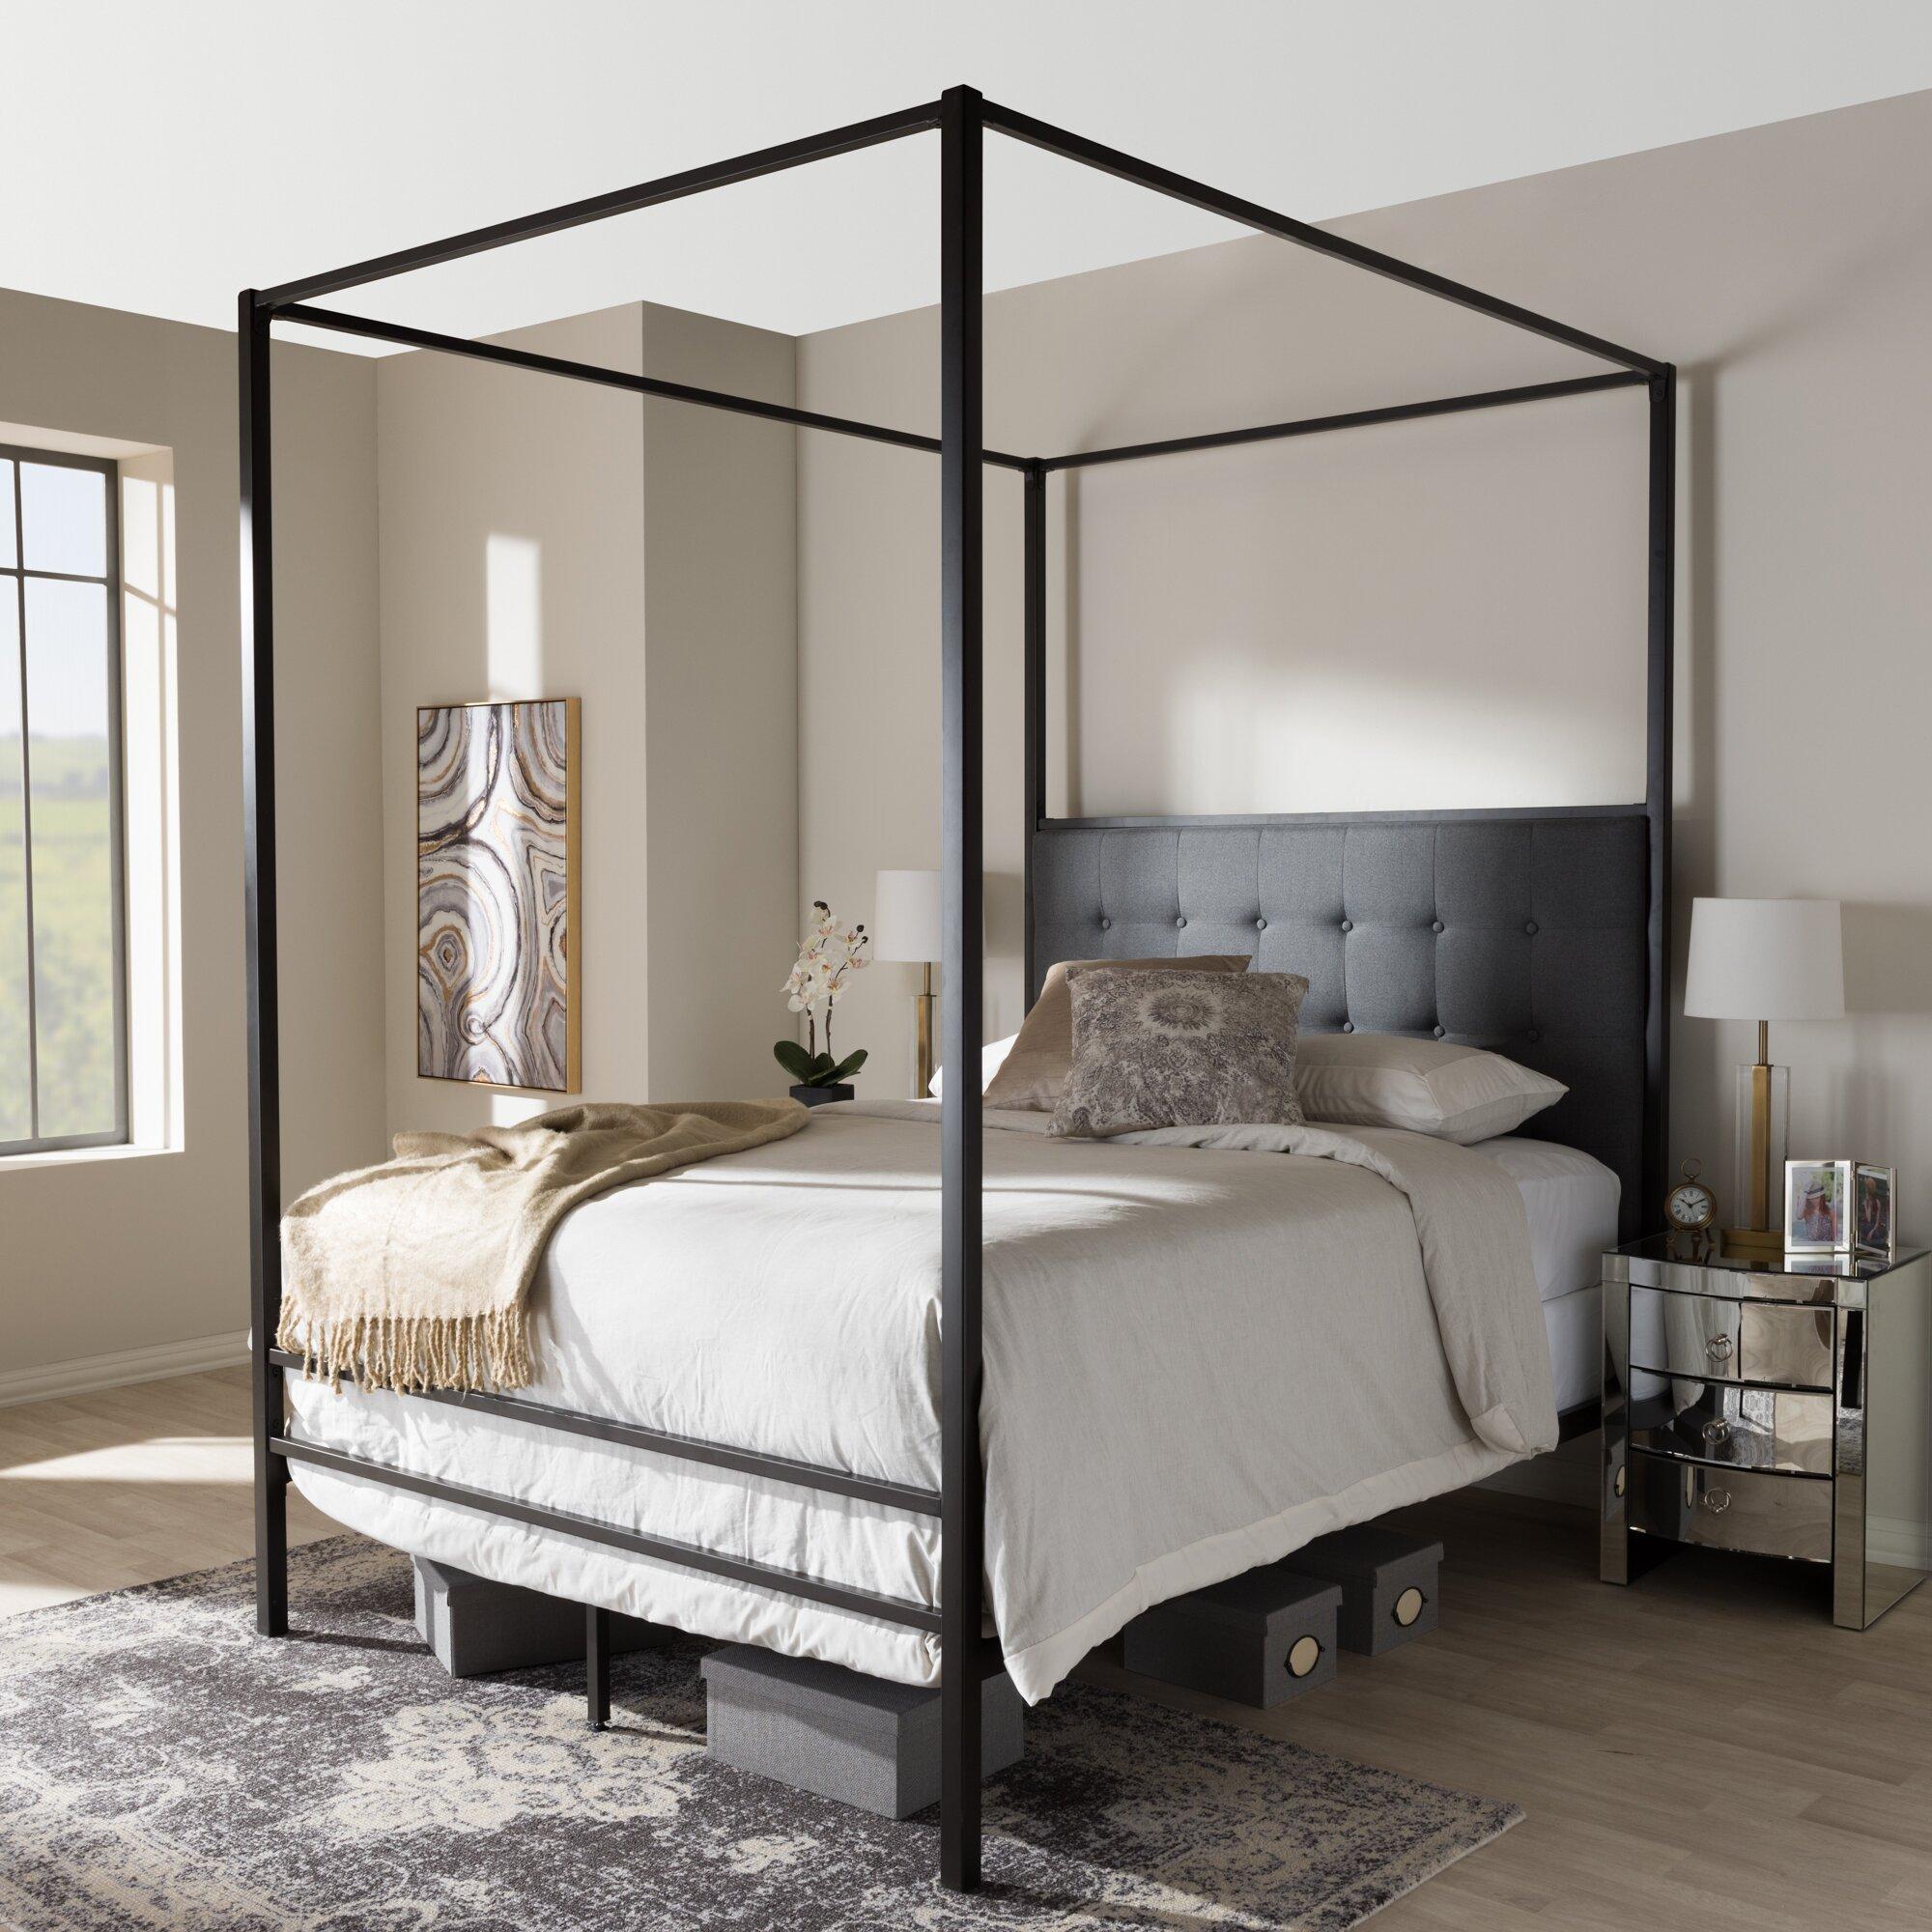 Baxton Studio Margherita Queen Canopy Bed Canopy Beds You ll Love Wayfair  Dhp  Gold Canopy. Dhp Gold Queen Beds   louisvuittonukonlinestore com